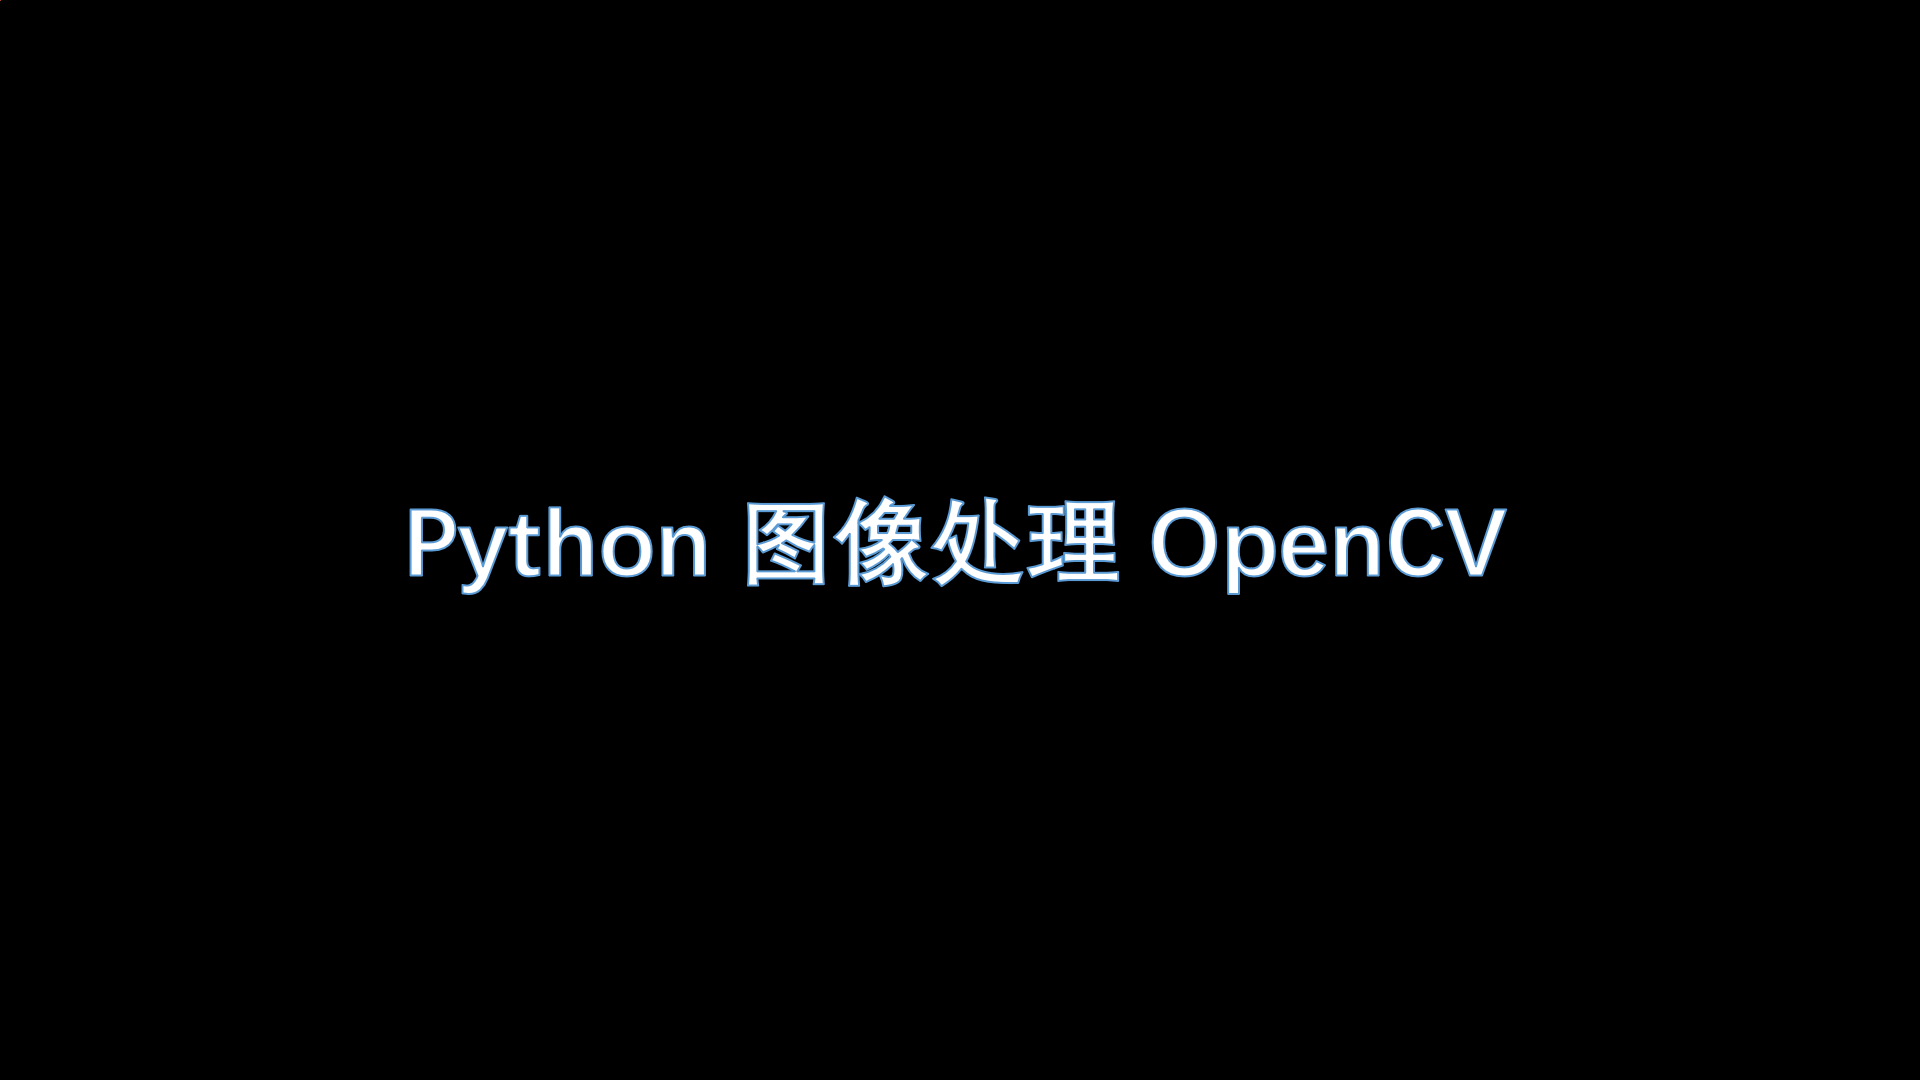 Python 圖像處理 OpenCV (12): Roberts 算子、 Prewitt 算子、 Sobel 算子和 Laplacian 算子邊緣檢測技術